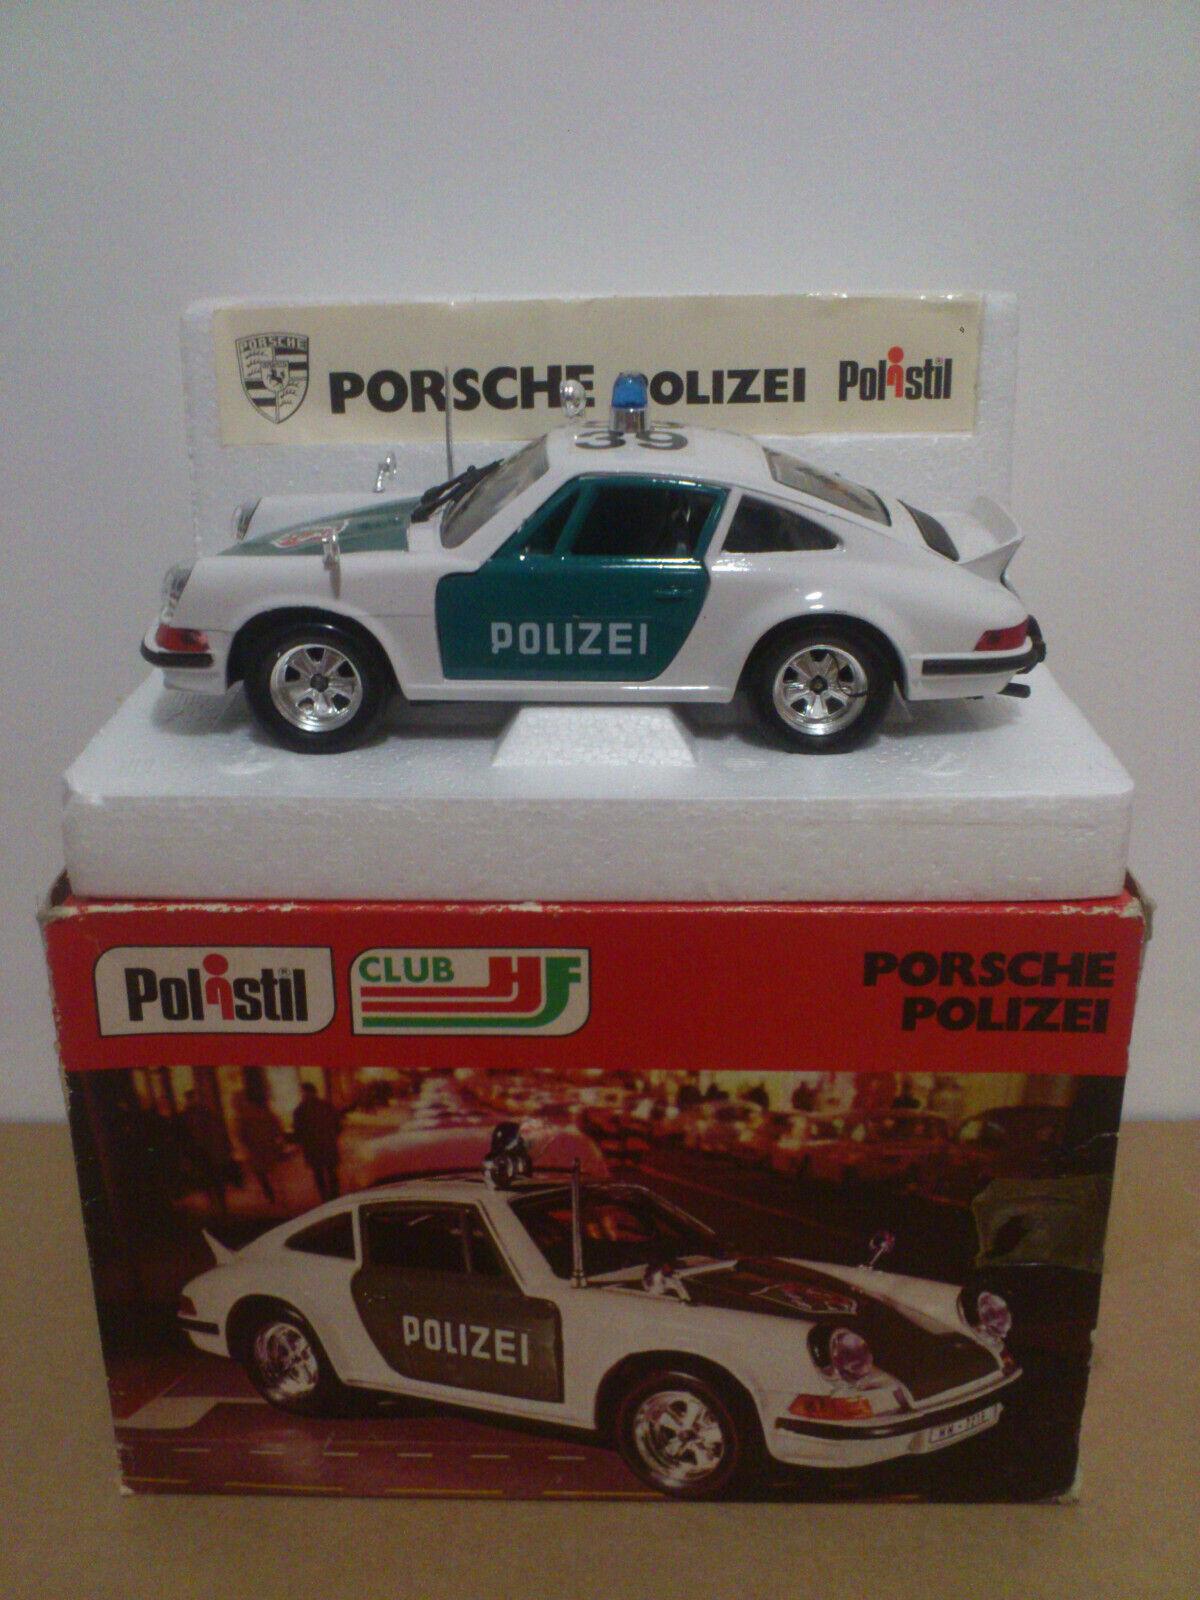 POLISTIL S 22  1 25   PORSCHE 911 POLIZEI    NEUF BOITE  MINT IN BOX